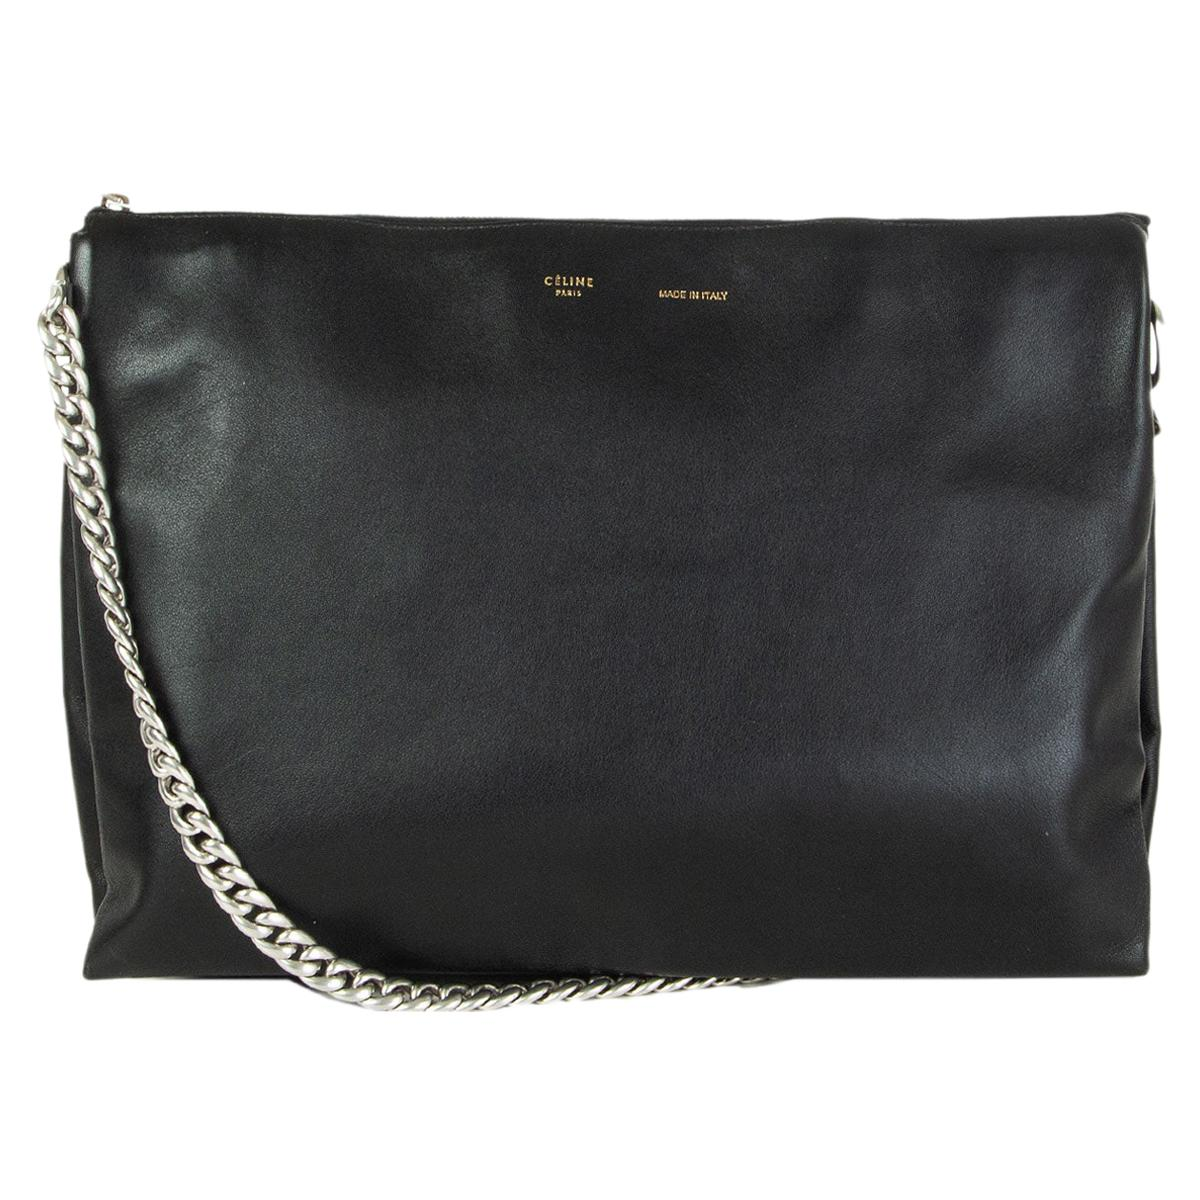 CELINE black leather SOFT TRIO CHAIN Shoulder Bag Clutch